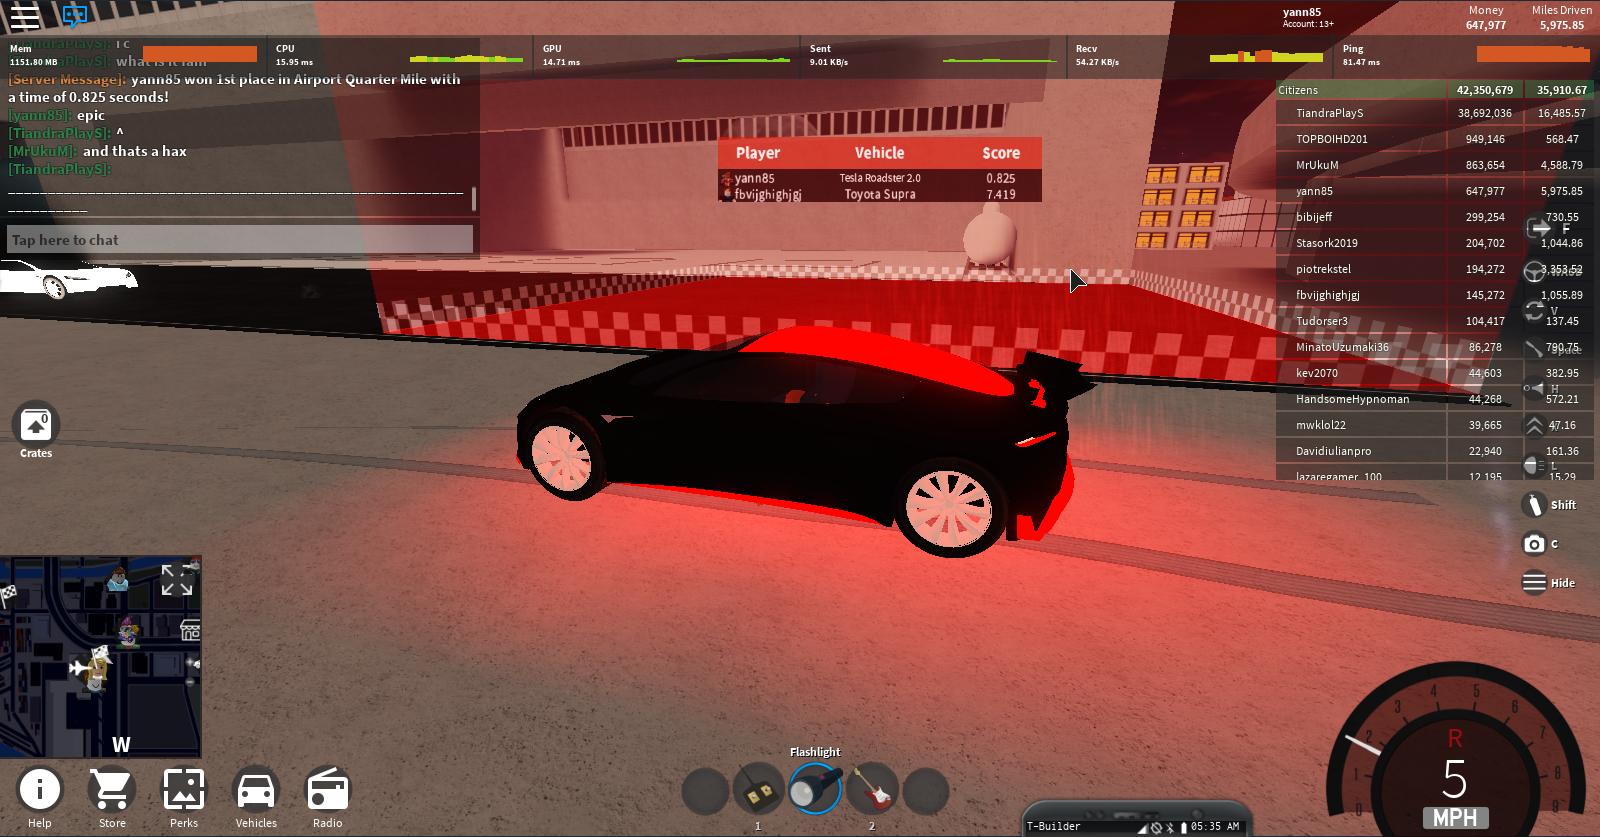 Roblox vehicle simulator codes fandom | Roblox Vehicle